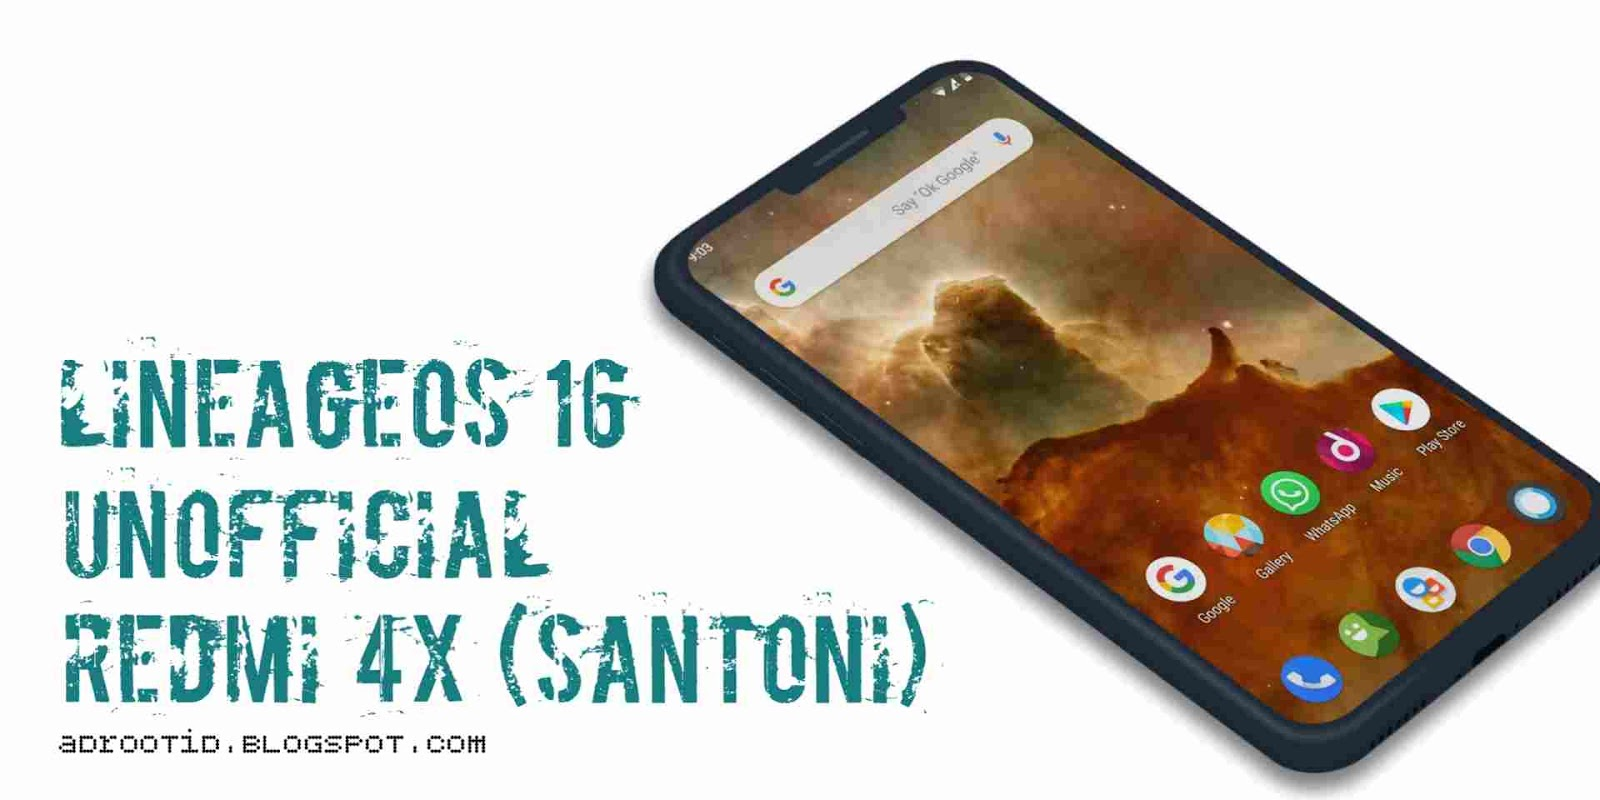 LineageOs 16.0 Redmi 4X